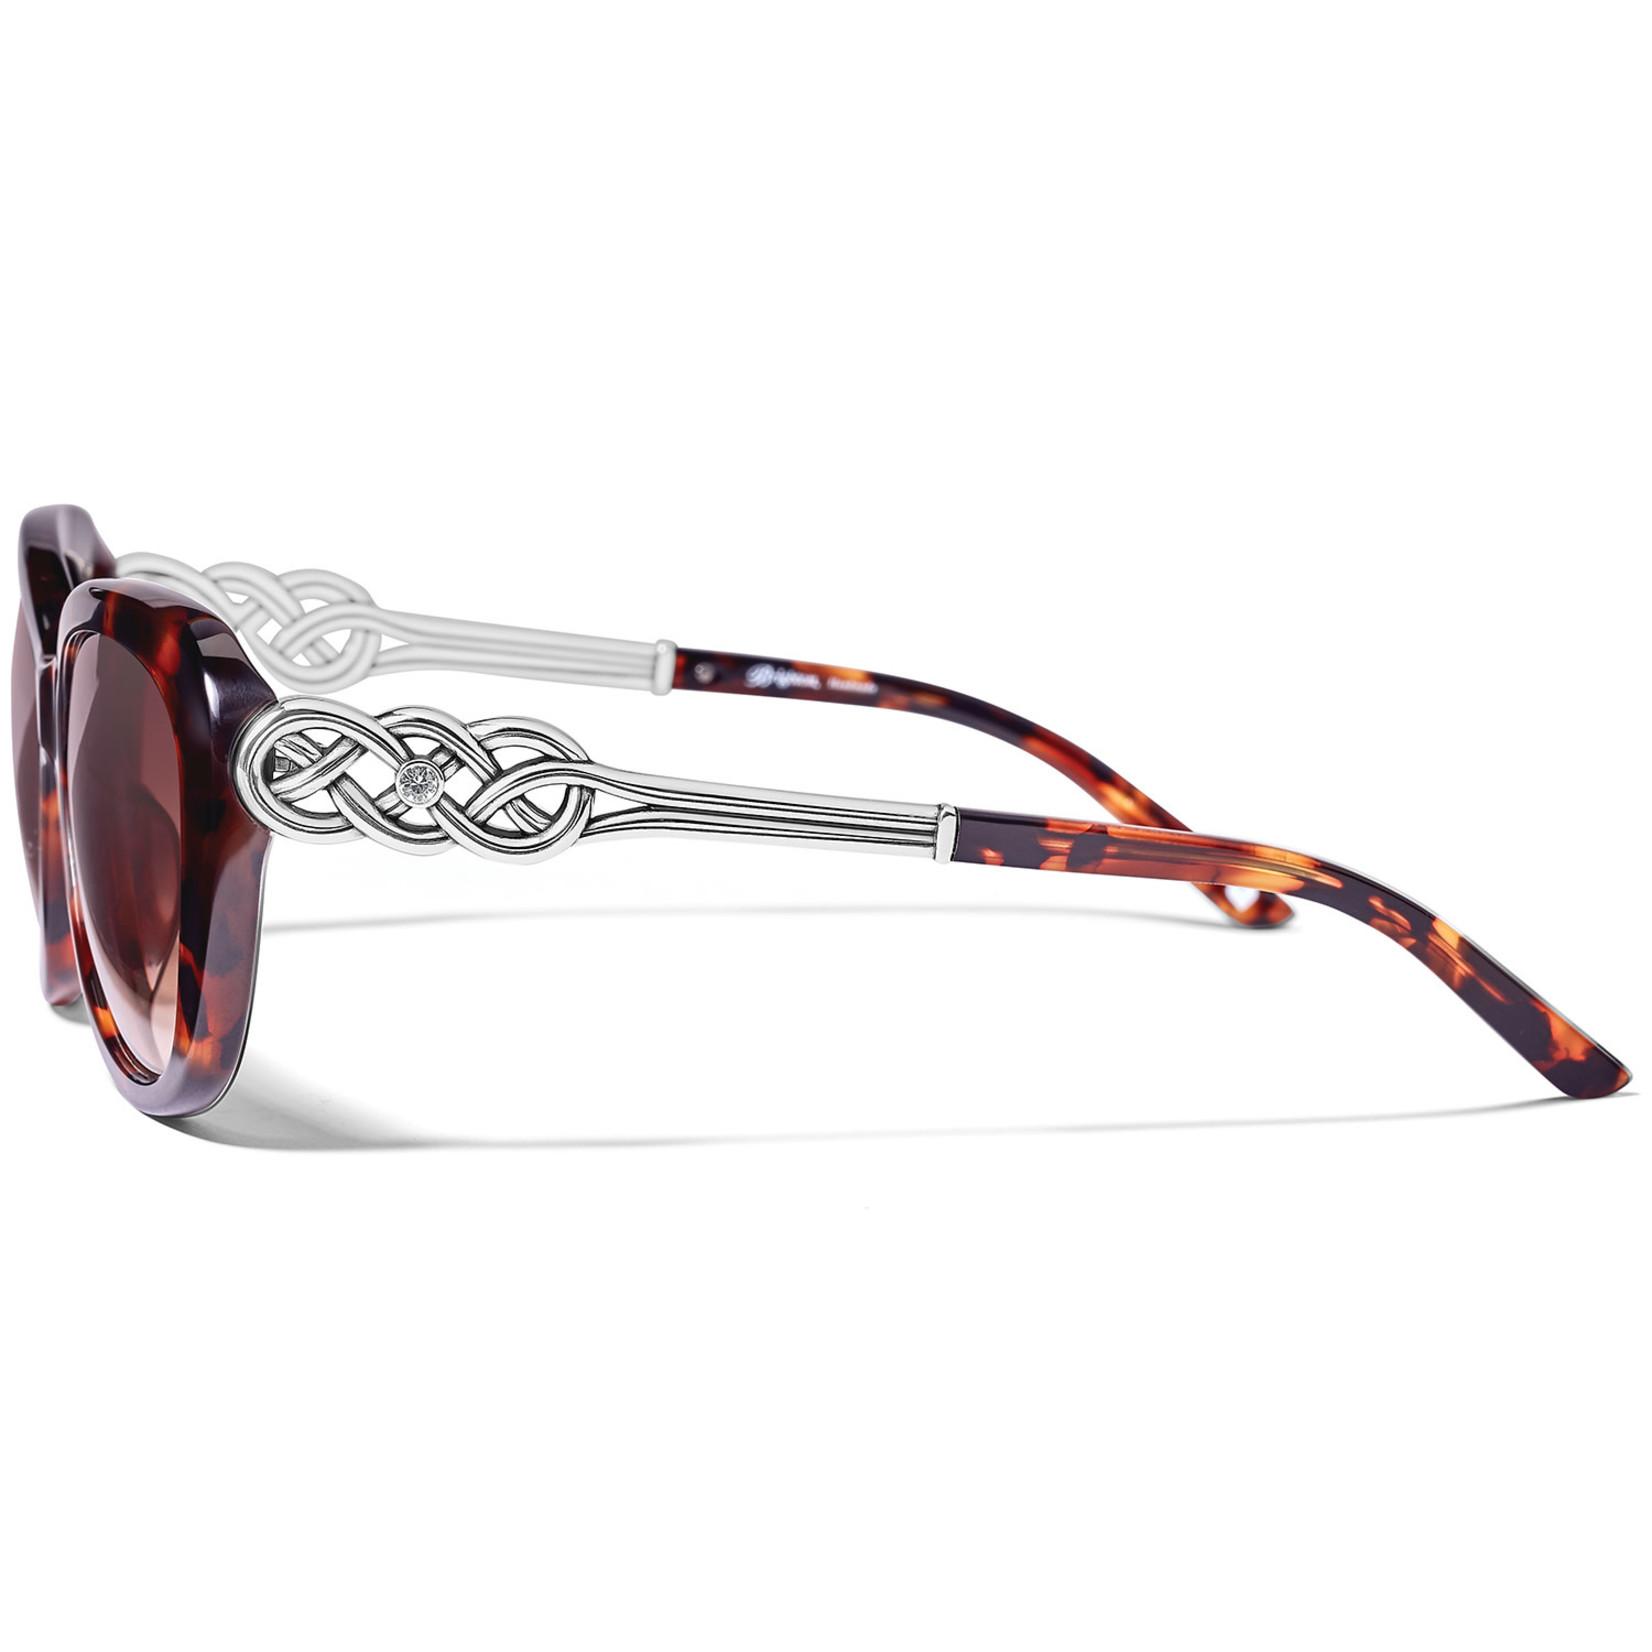 Brighton Interlok Cascade Sunglasses - Tortoise